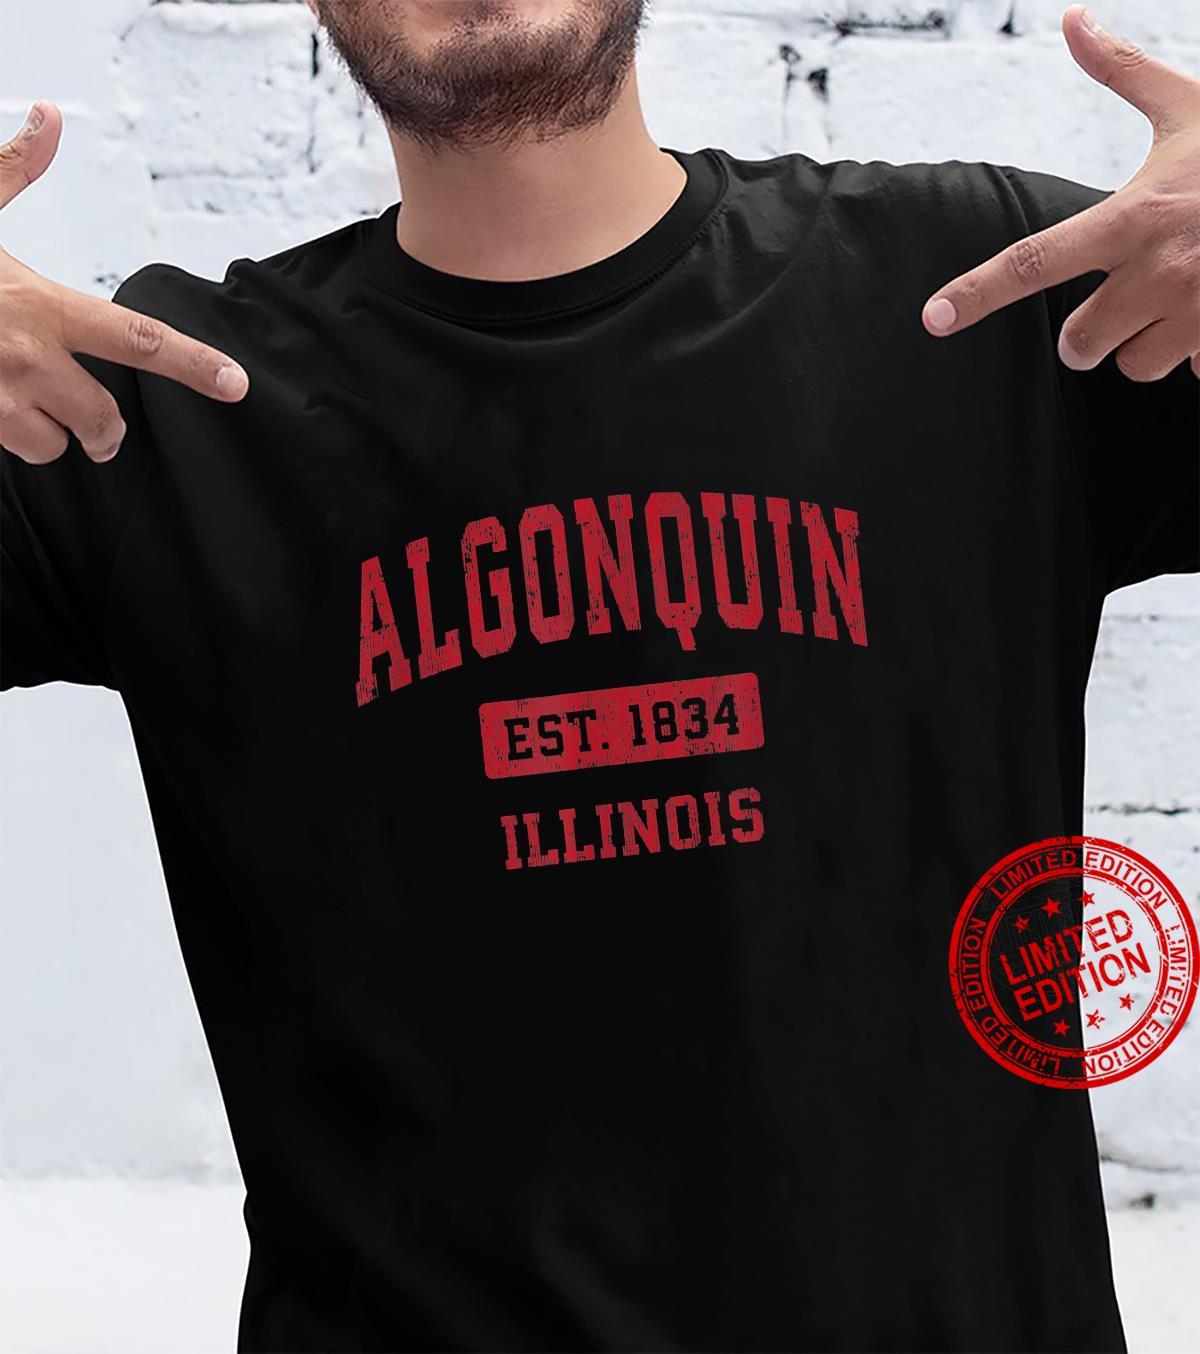 Algonquin Illinois IL Vintage Sports Design Red Design Shirt